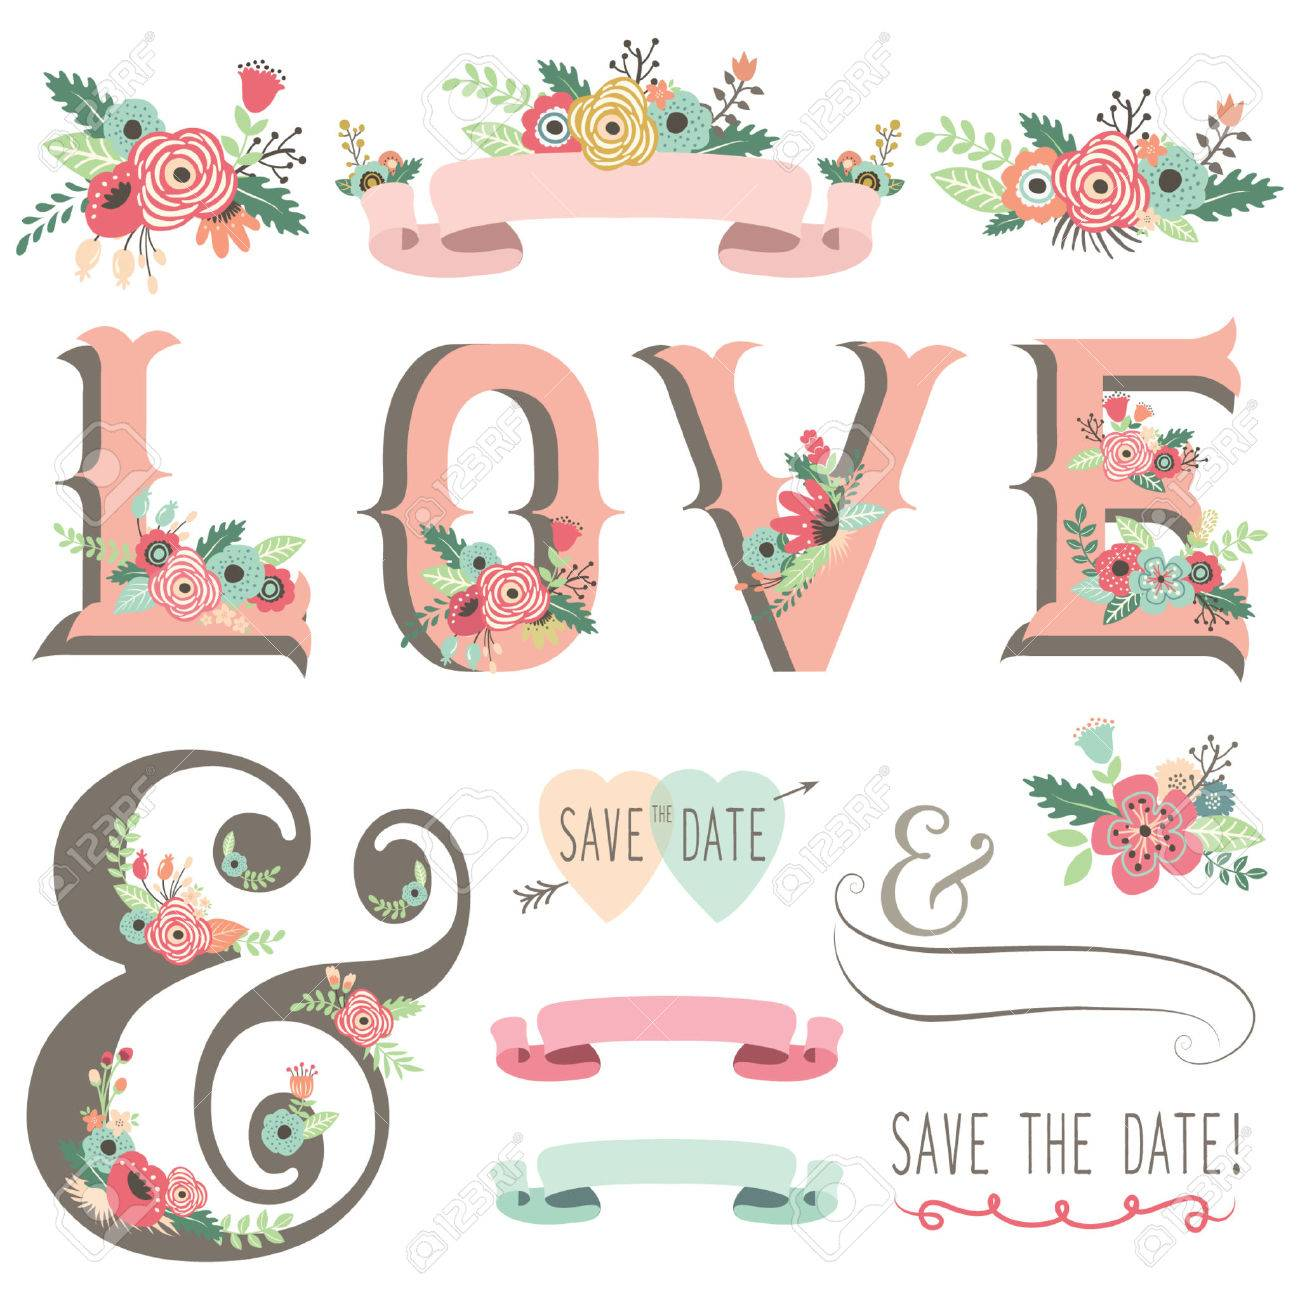 Wedding Flower Love Design Elements Stock Vector - 43624816